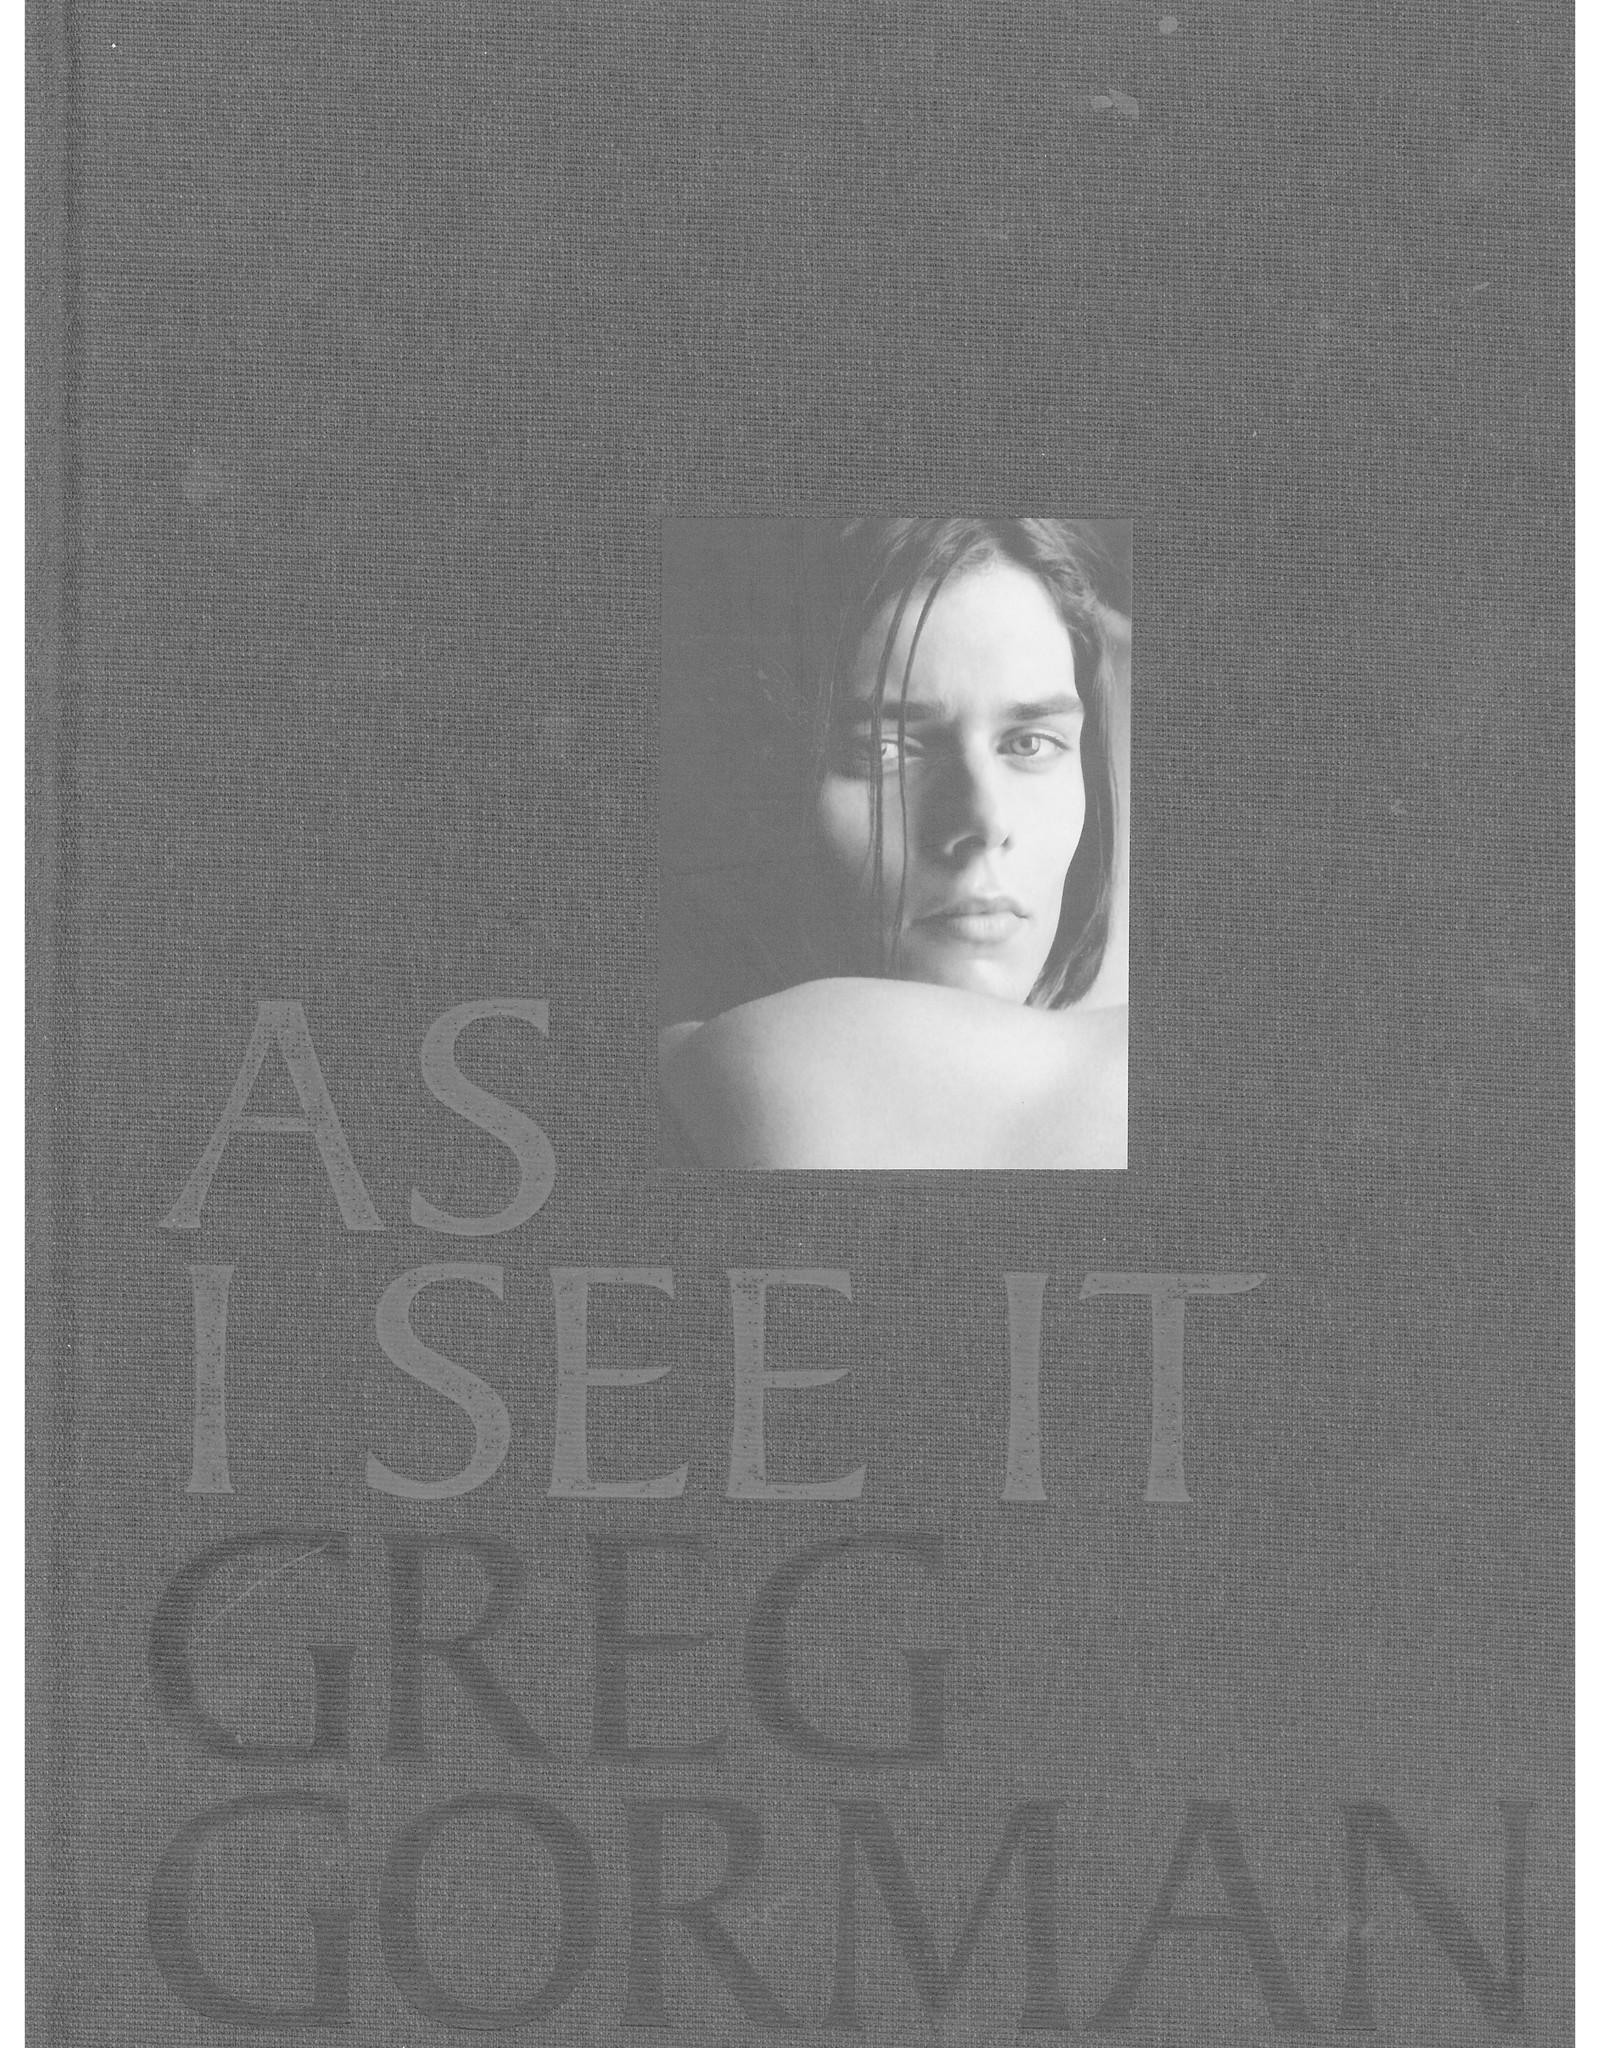 As I See It / Greg Gorman